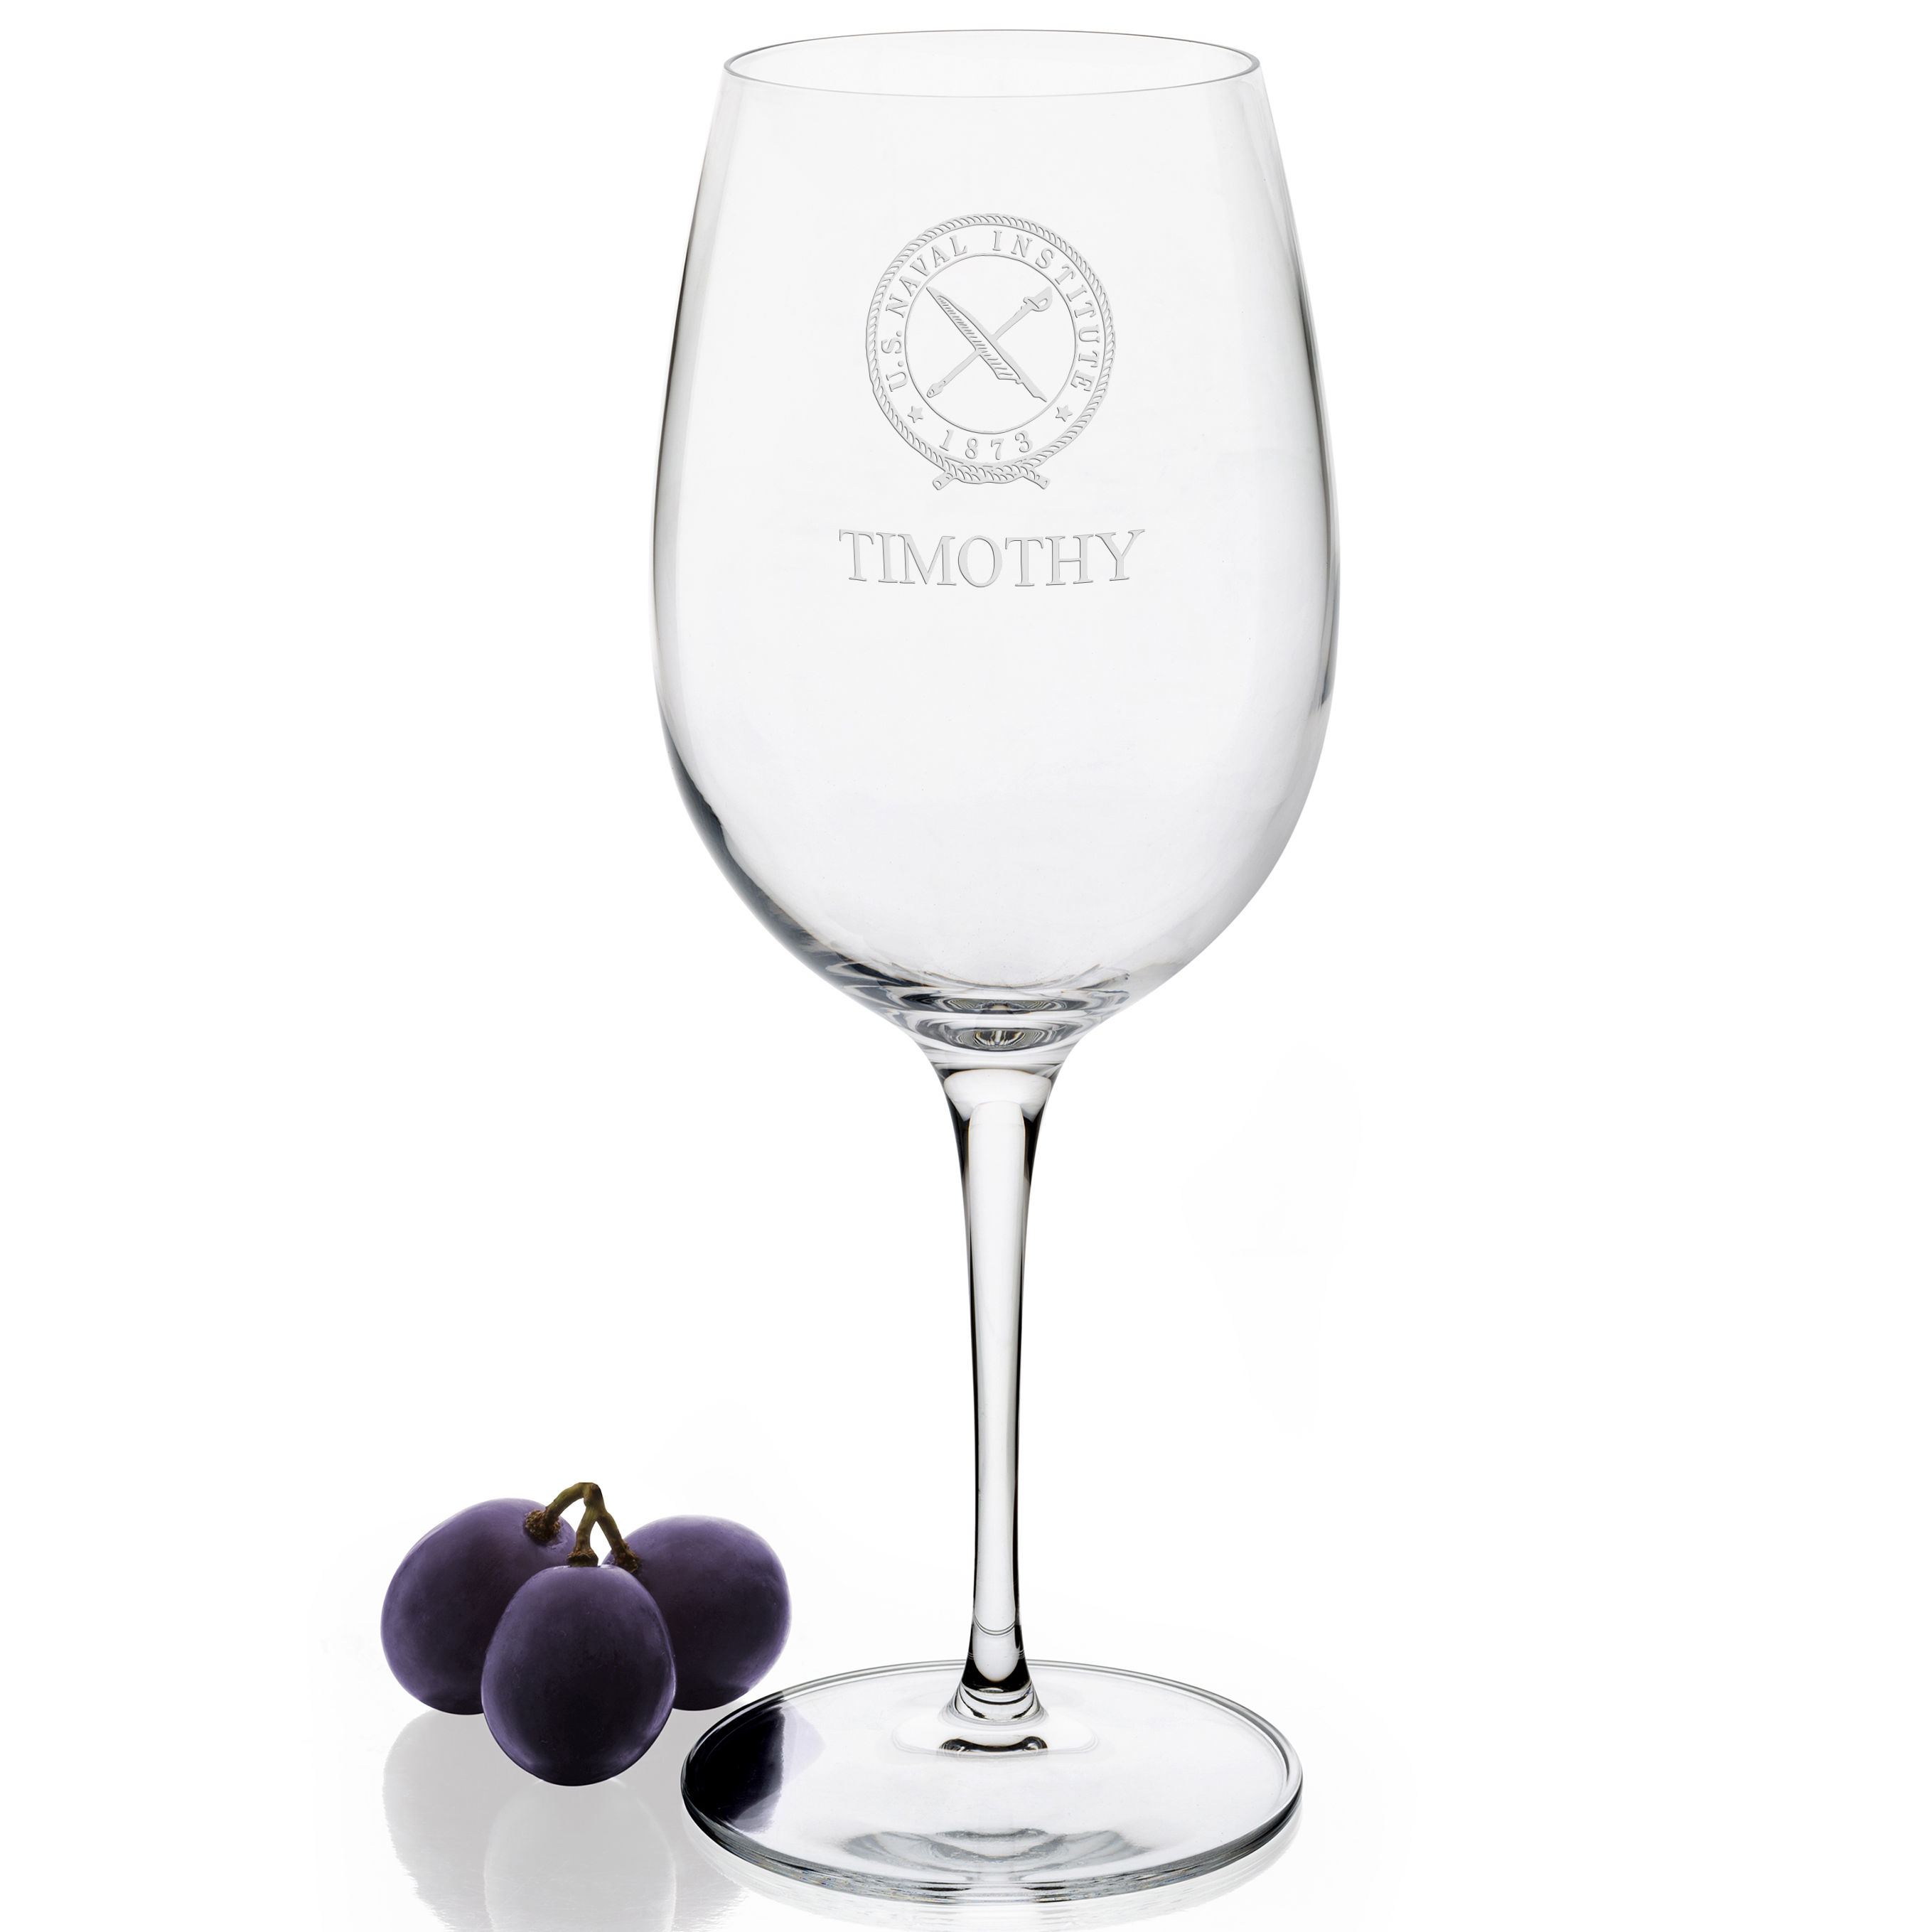 U.S. Naval Institute Red Wine Glasses - Set of 4 - Image 2